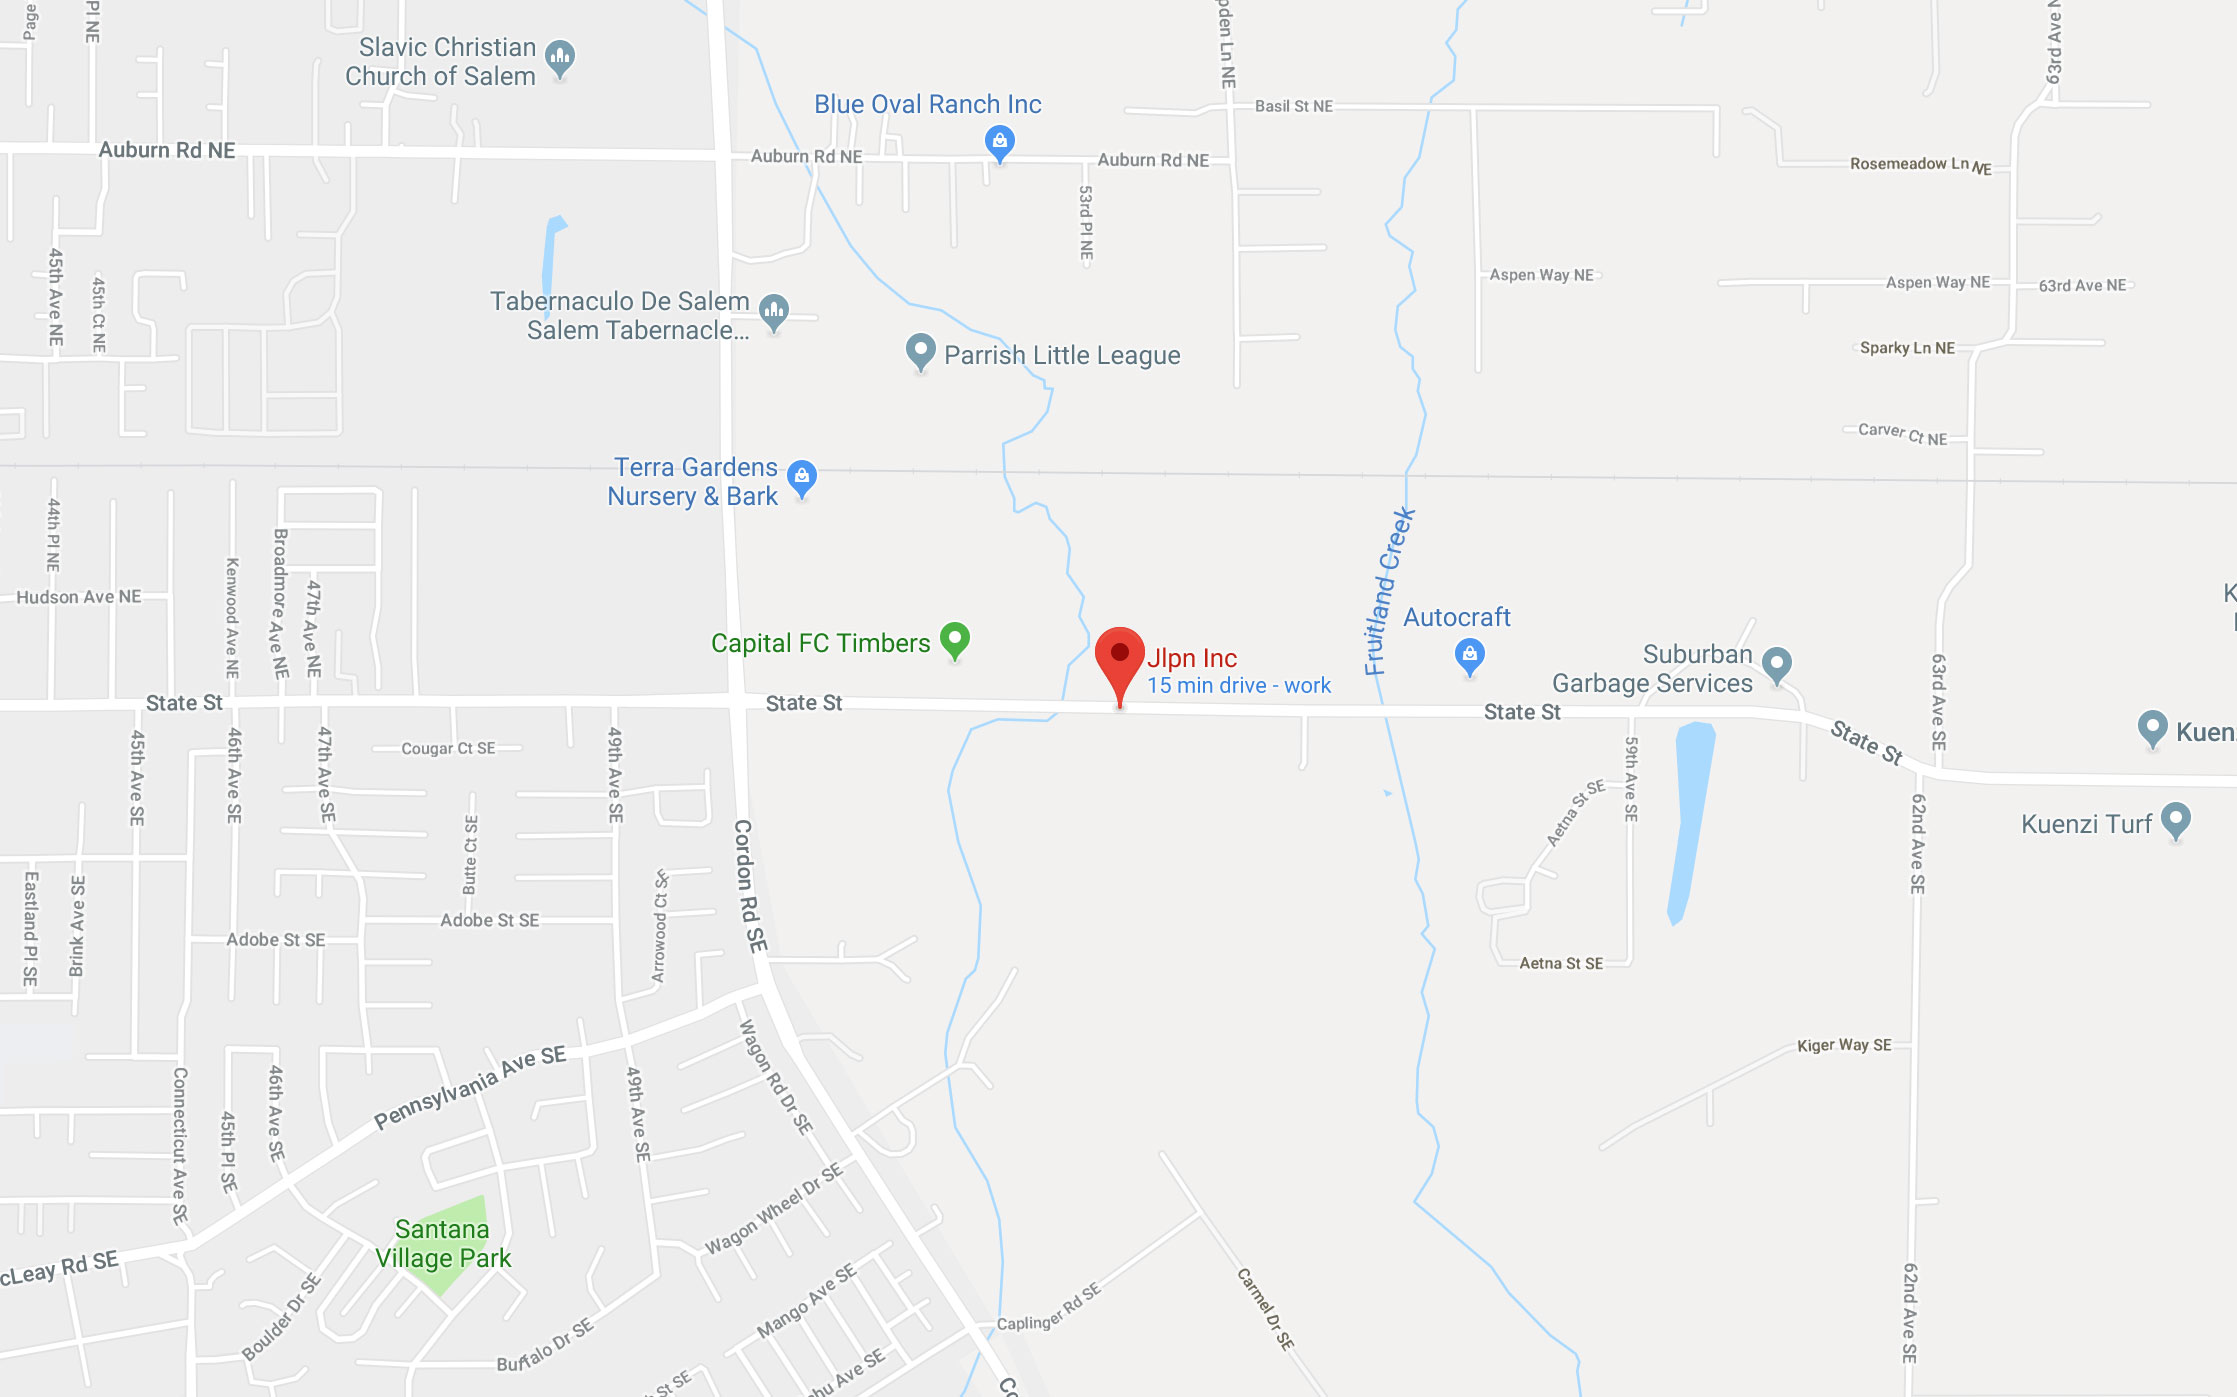 JLPN - Contact: 503-373-9781 - Nursery Location: 5440 State Street, Salem, Oregon 97301. Mailing: 1118 Lancaster Drive NE #409, Salem, Oregon 97301